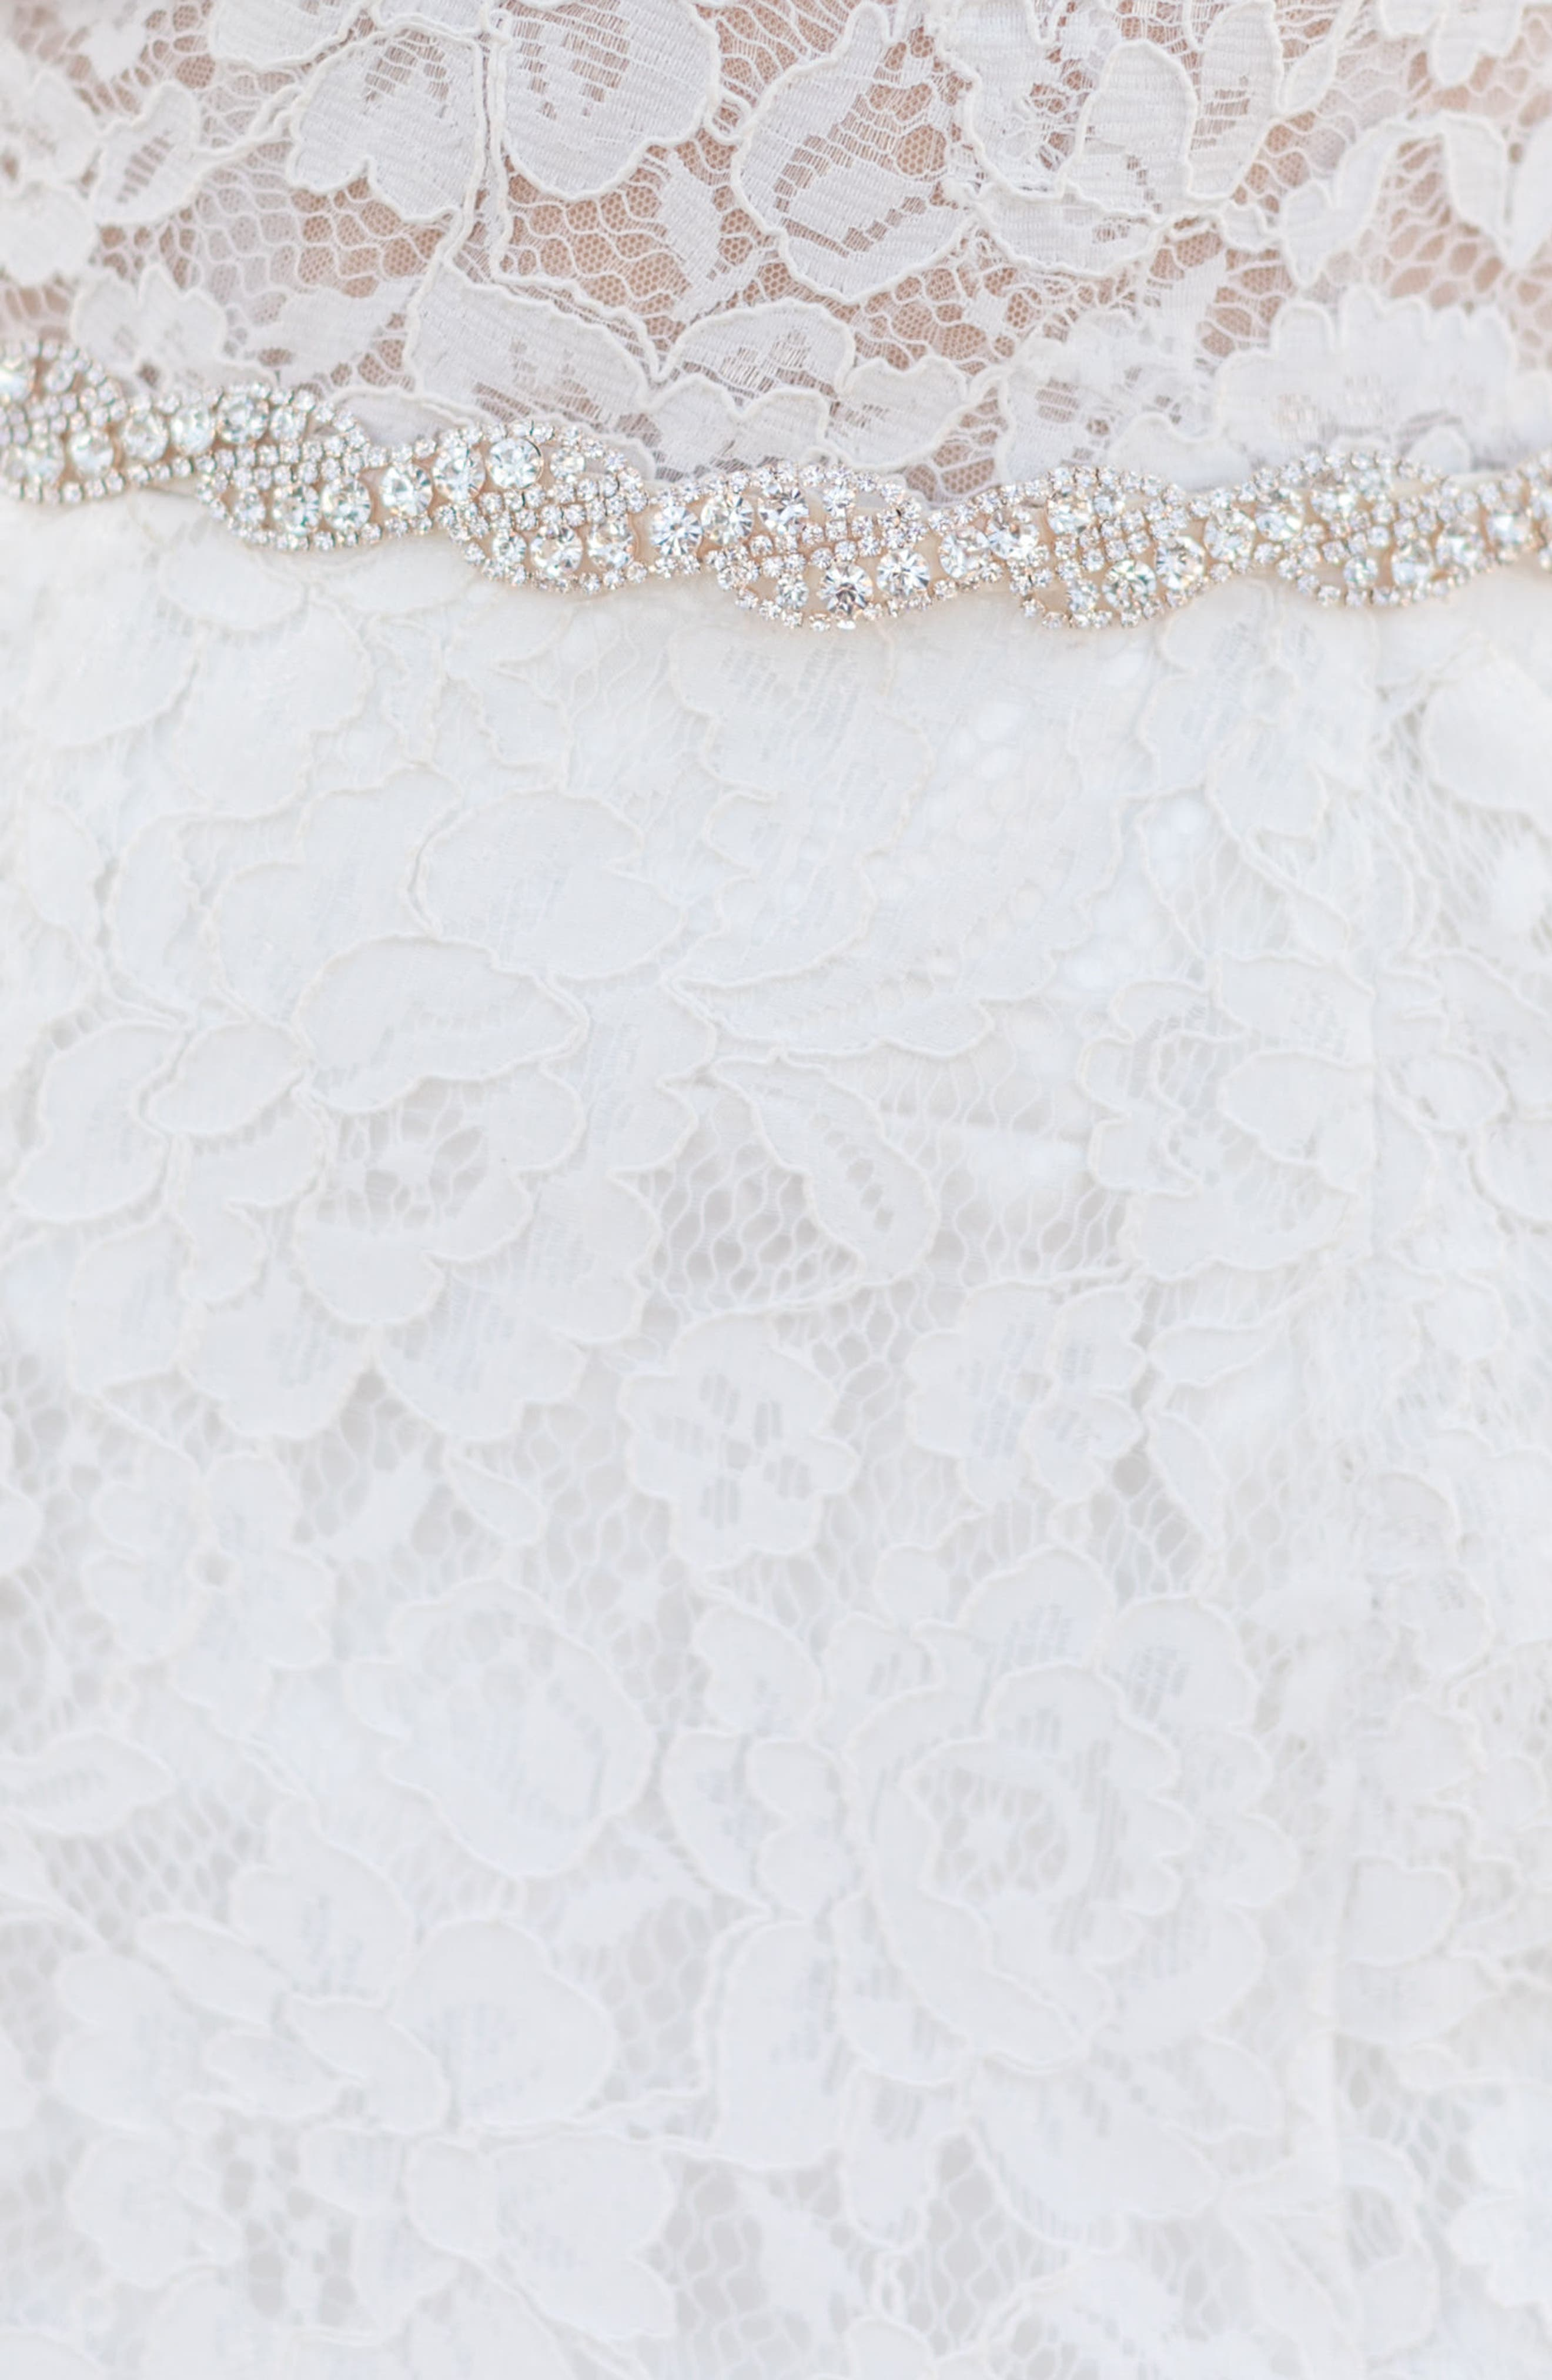 Aliza Crystal Overlay Belt,                             Alternate thumbnail 2, color,                             Rose Gold